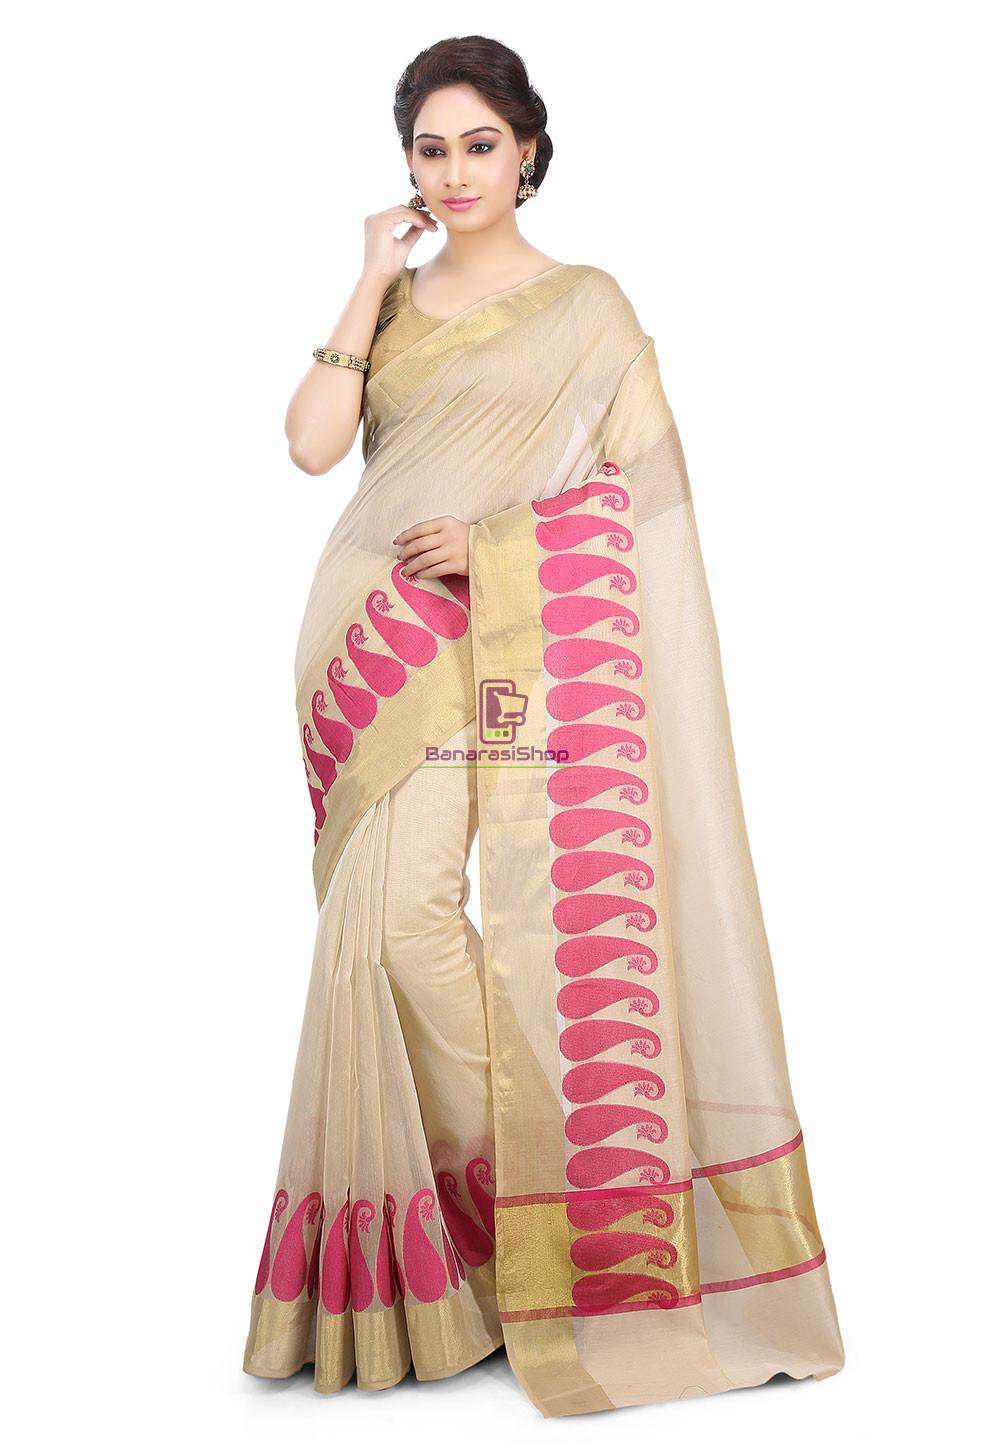 Woven Banarasi Chanderi Cotton Saree in Beige 1